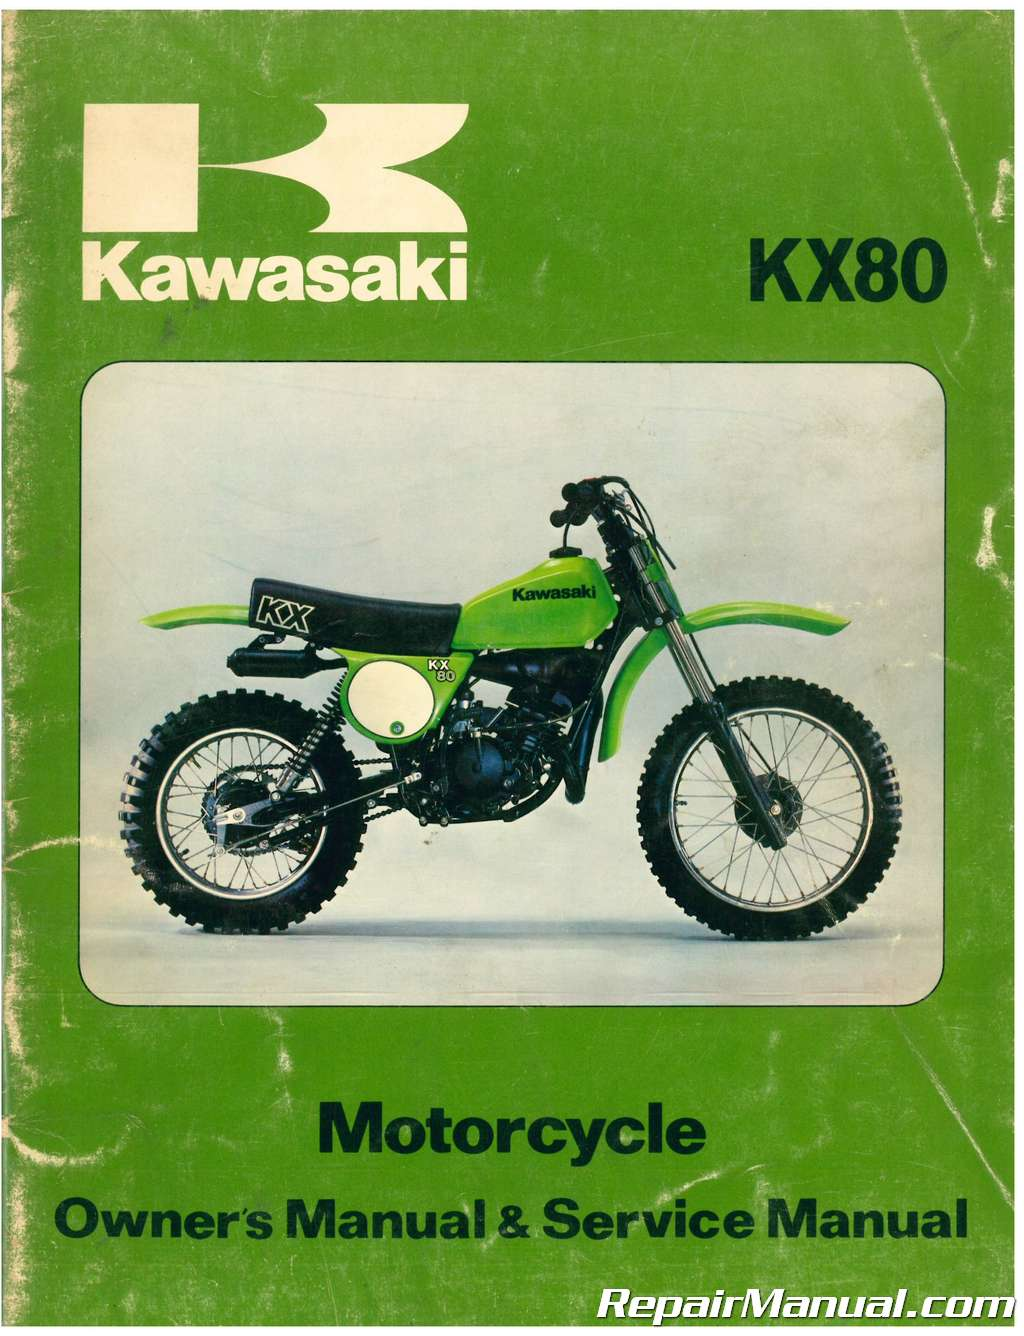 Used 1979 Kawasaki Kx80